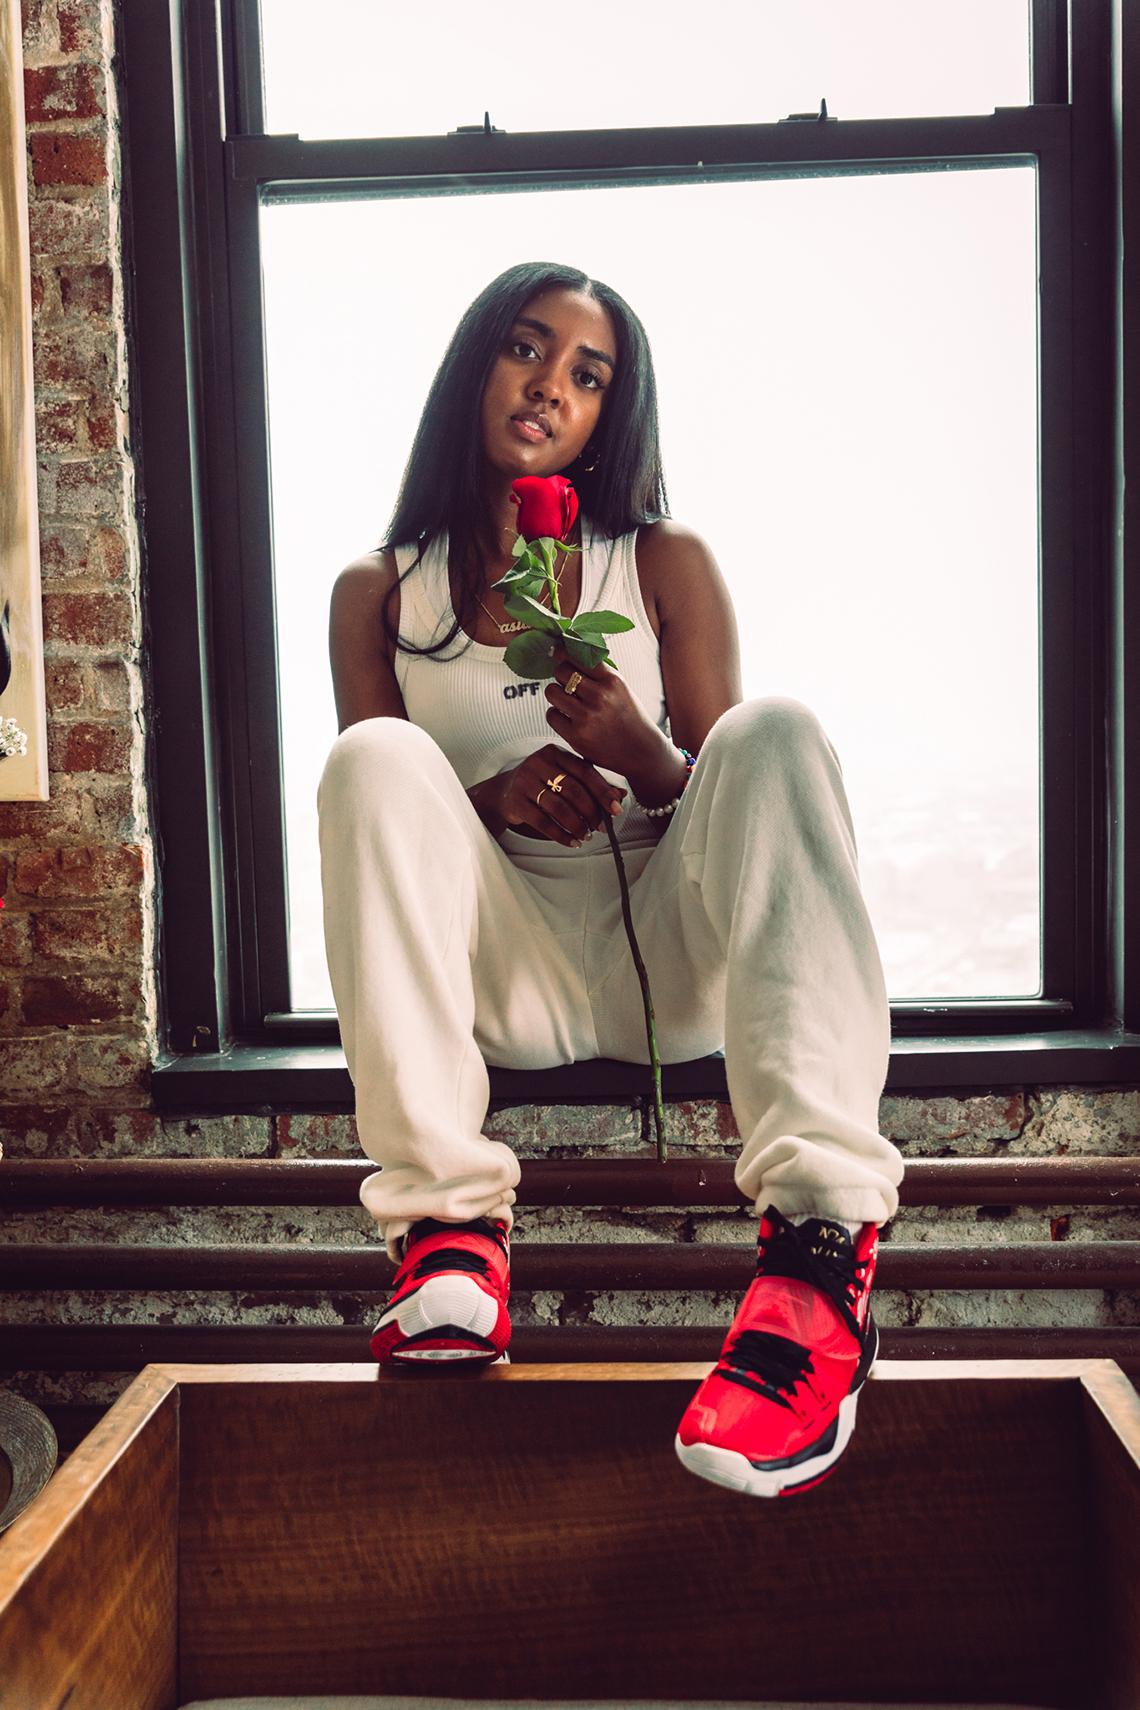 Sneaker Room Nike Kyrie 6 Mom スニーカー ルーム ナイキ コラボ 6 マム image on feet model rose